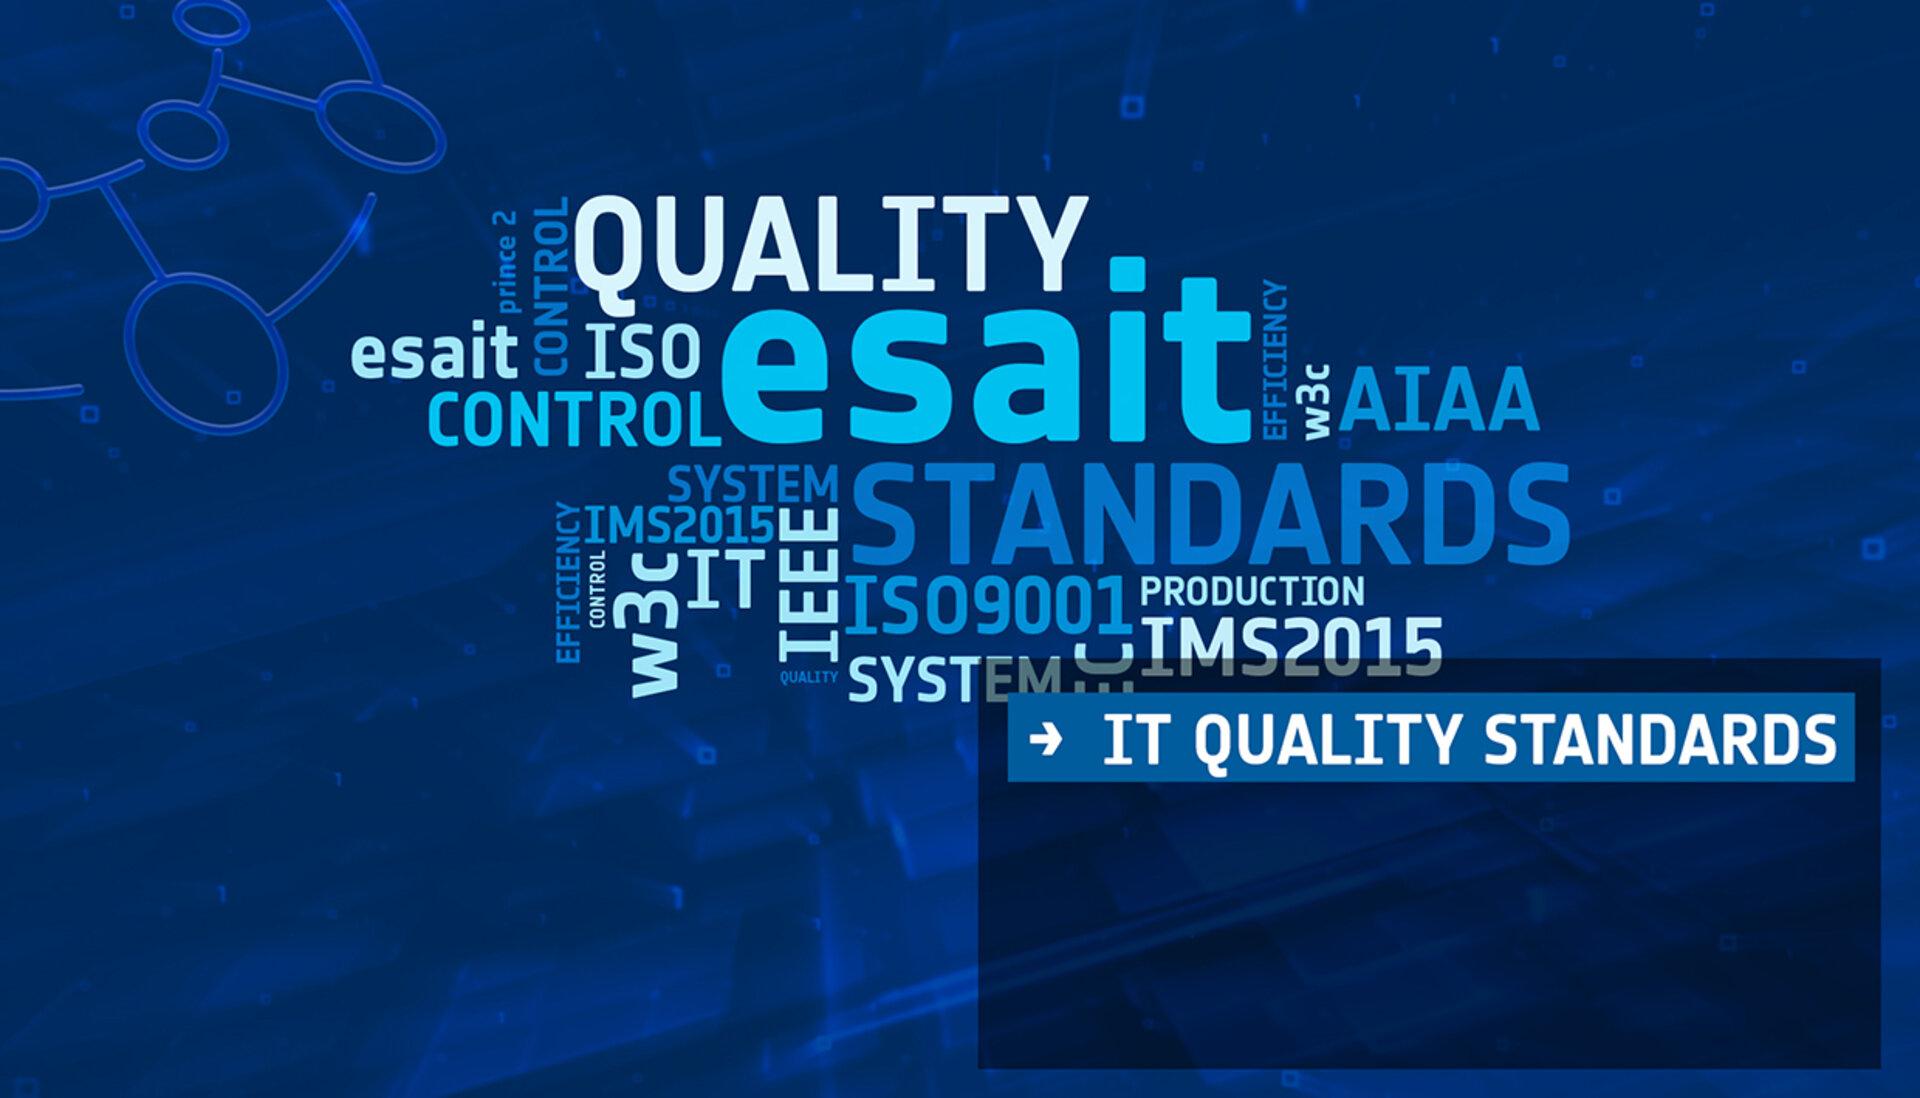 CTSAFE ISO 9001 Lead Auditor (self-study)